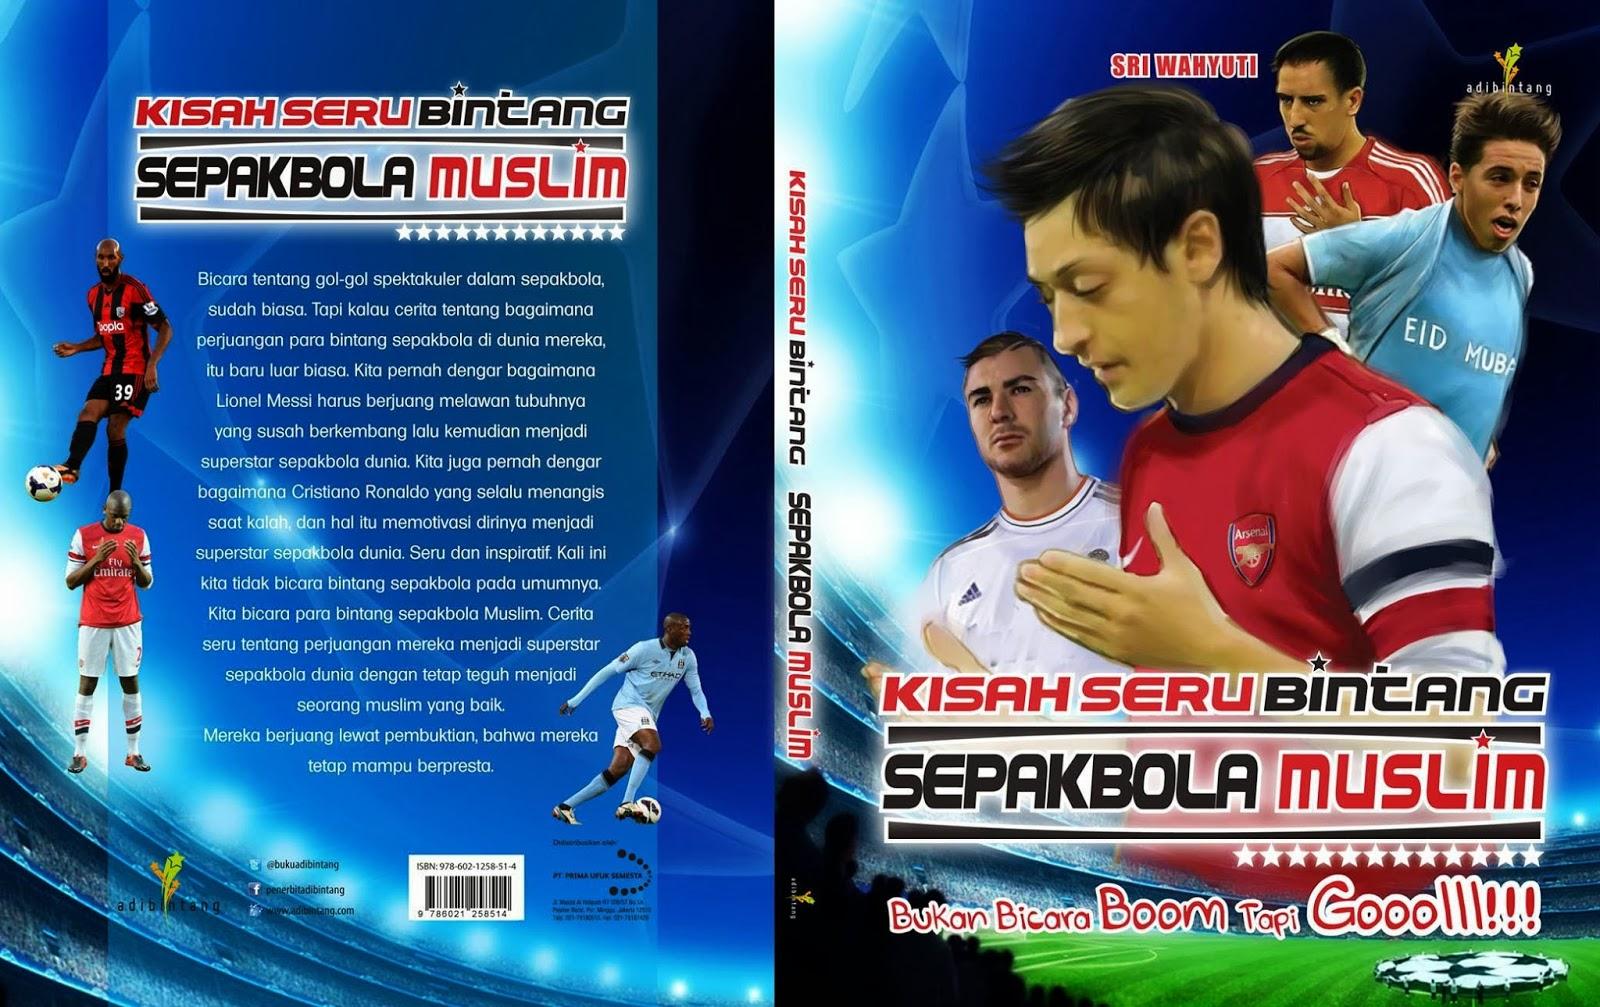 Judul Judul Sepak Bola Bola Sepak Permainan Permainanonline Wahyuti Journal Buku Baru Kisah Seru Bintang Sepak Bola Muslim